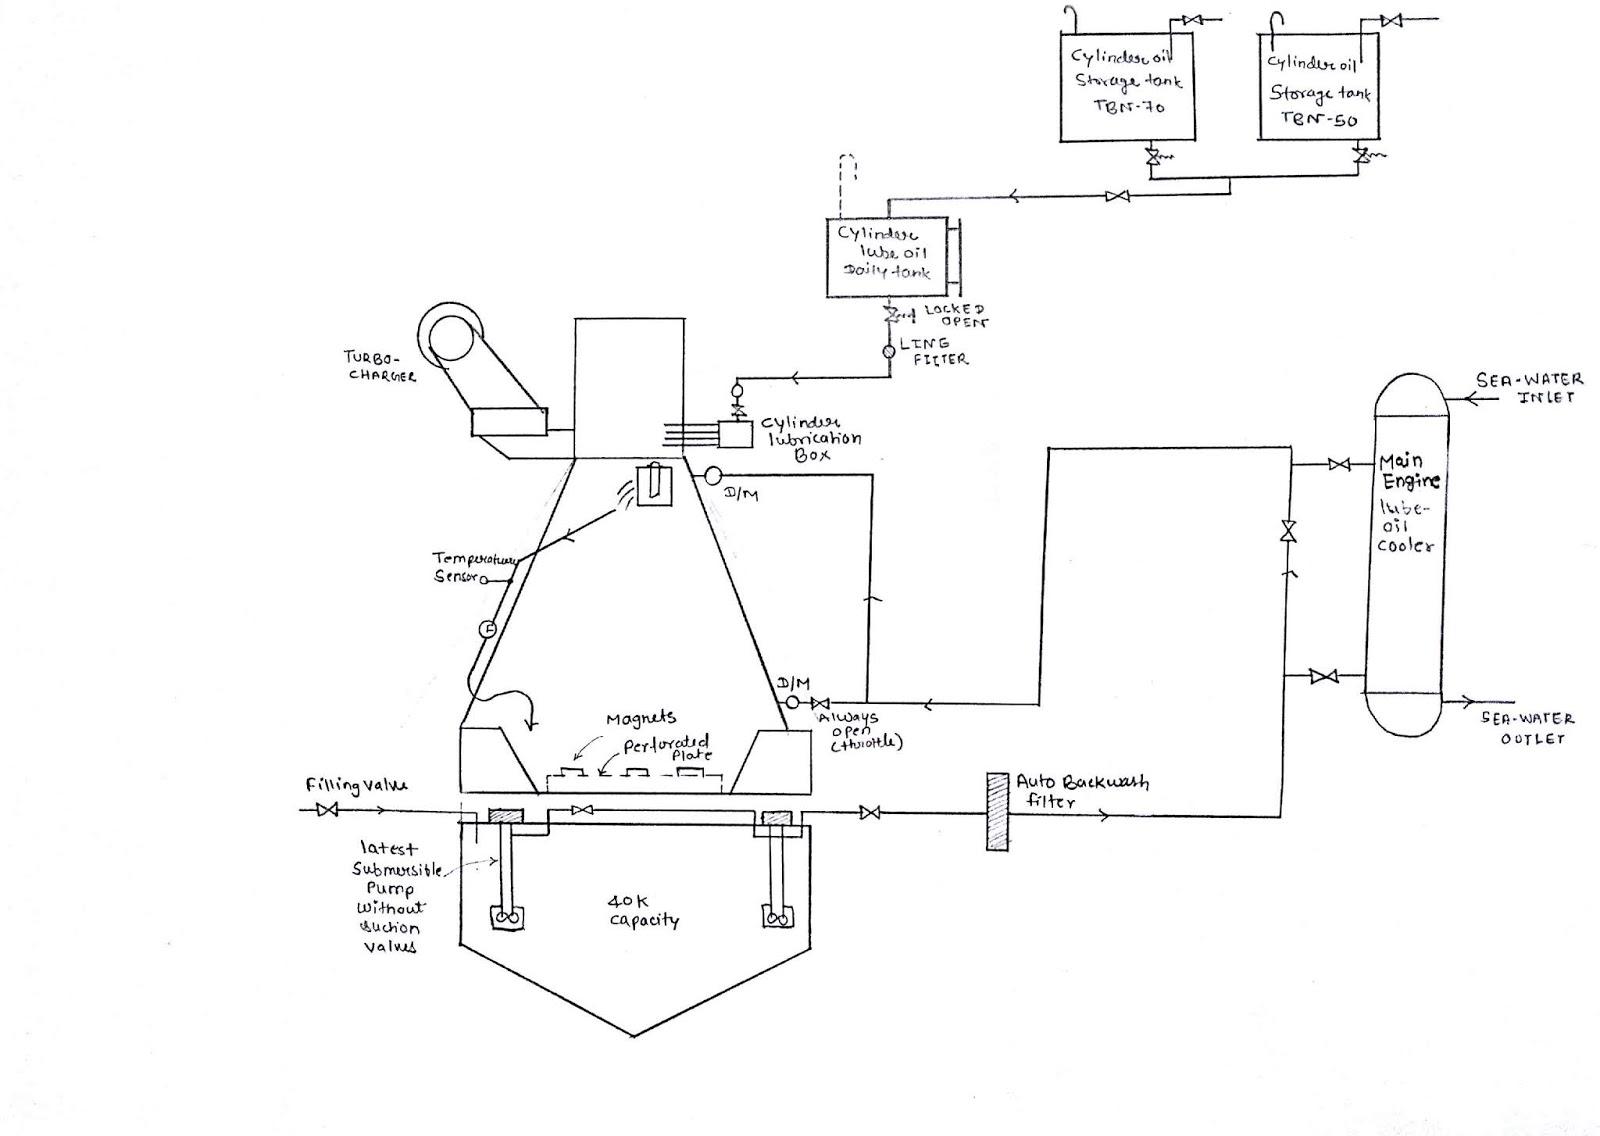 diagram of main engine [ 1600 x 1136 Pixel ]